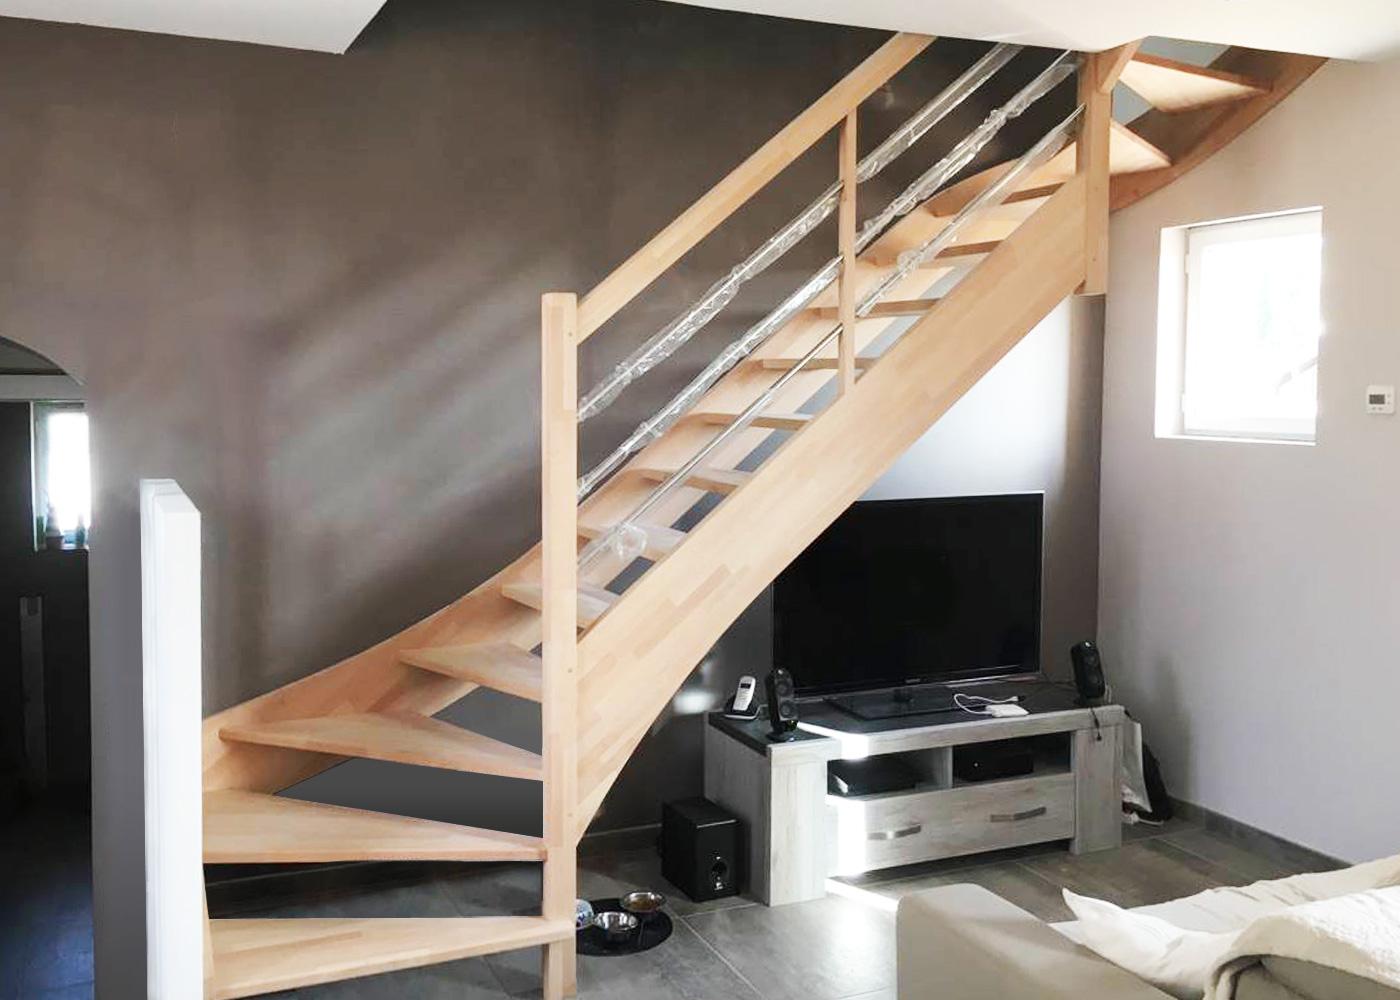 Escalier 2 quarts tournants en hêtre massif